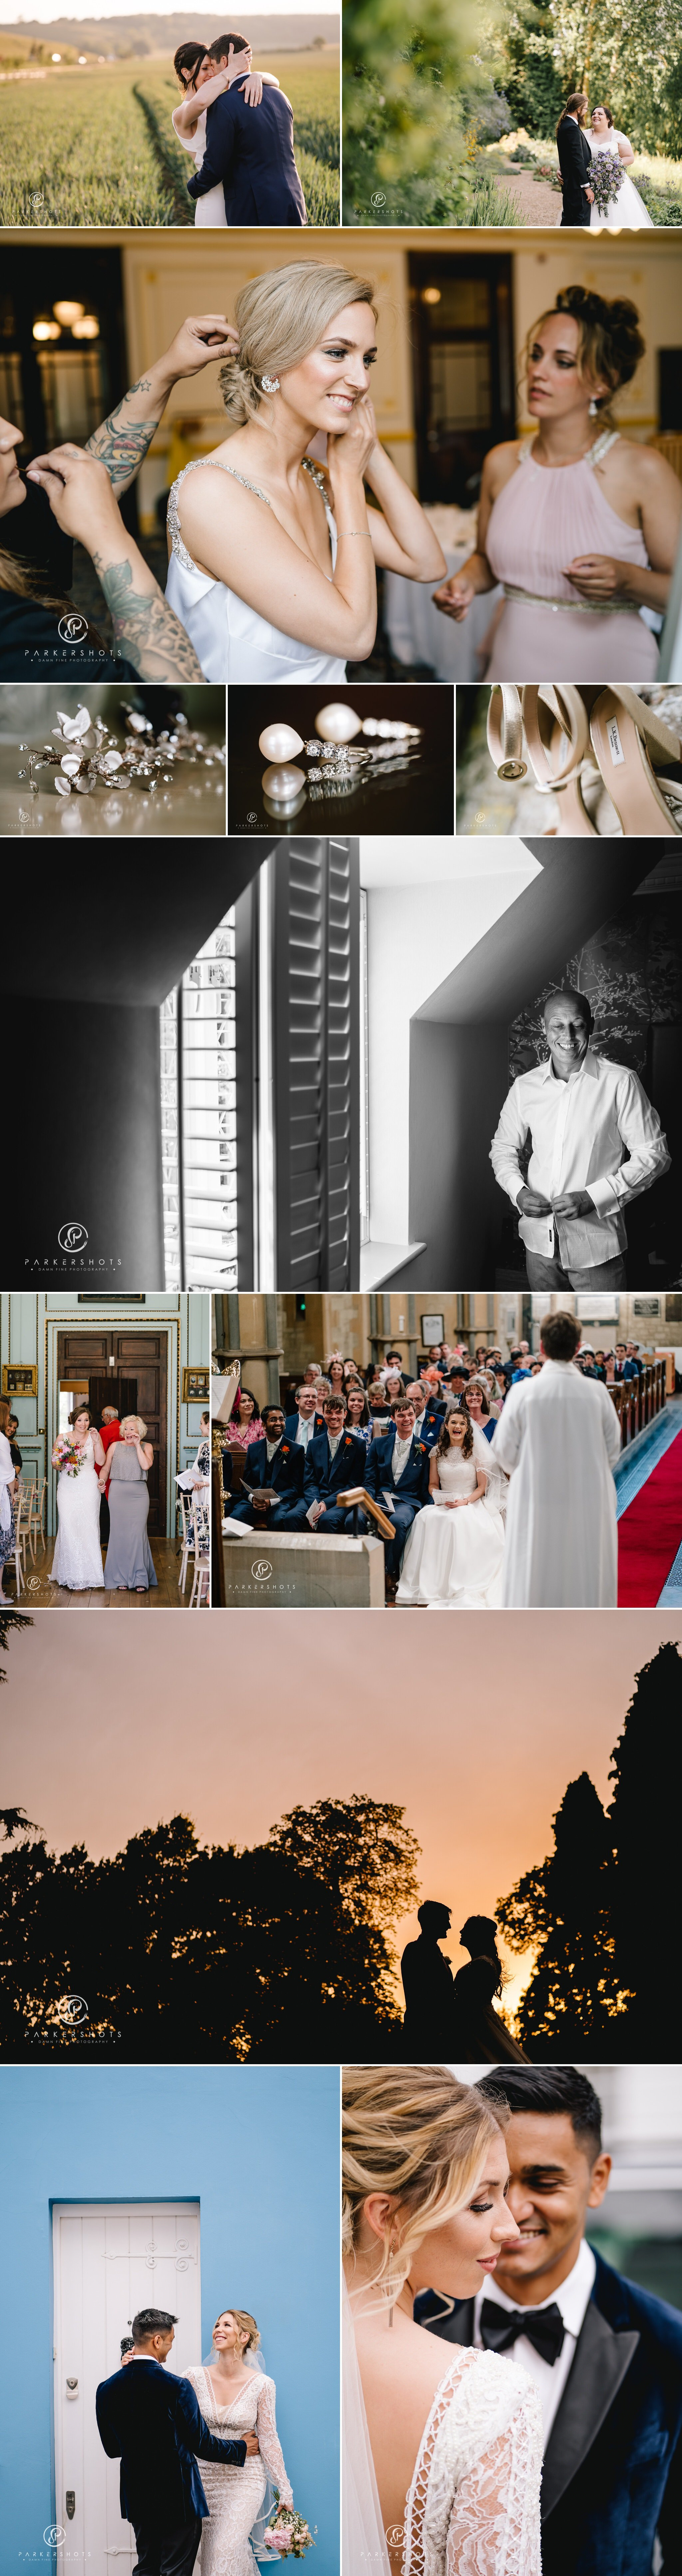 Best of Kent Wedding Photographers 2019